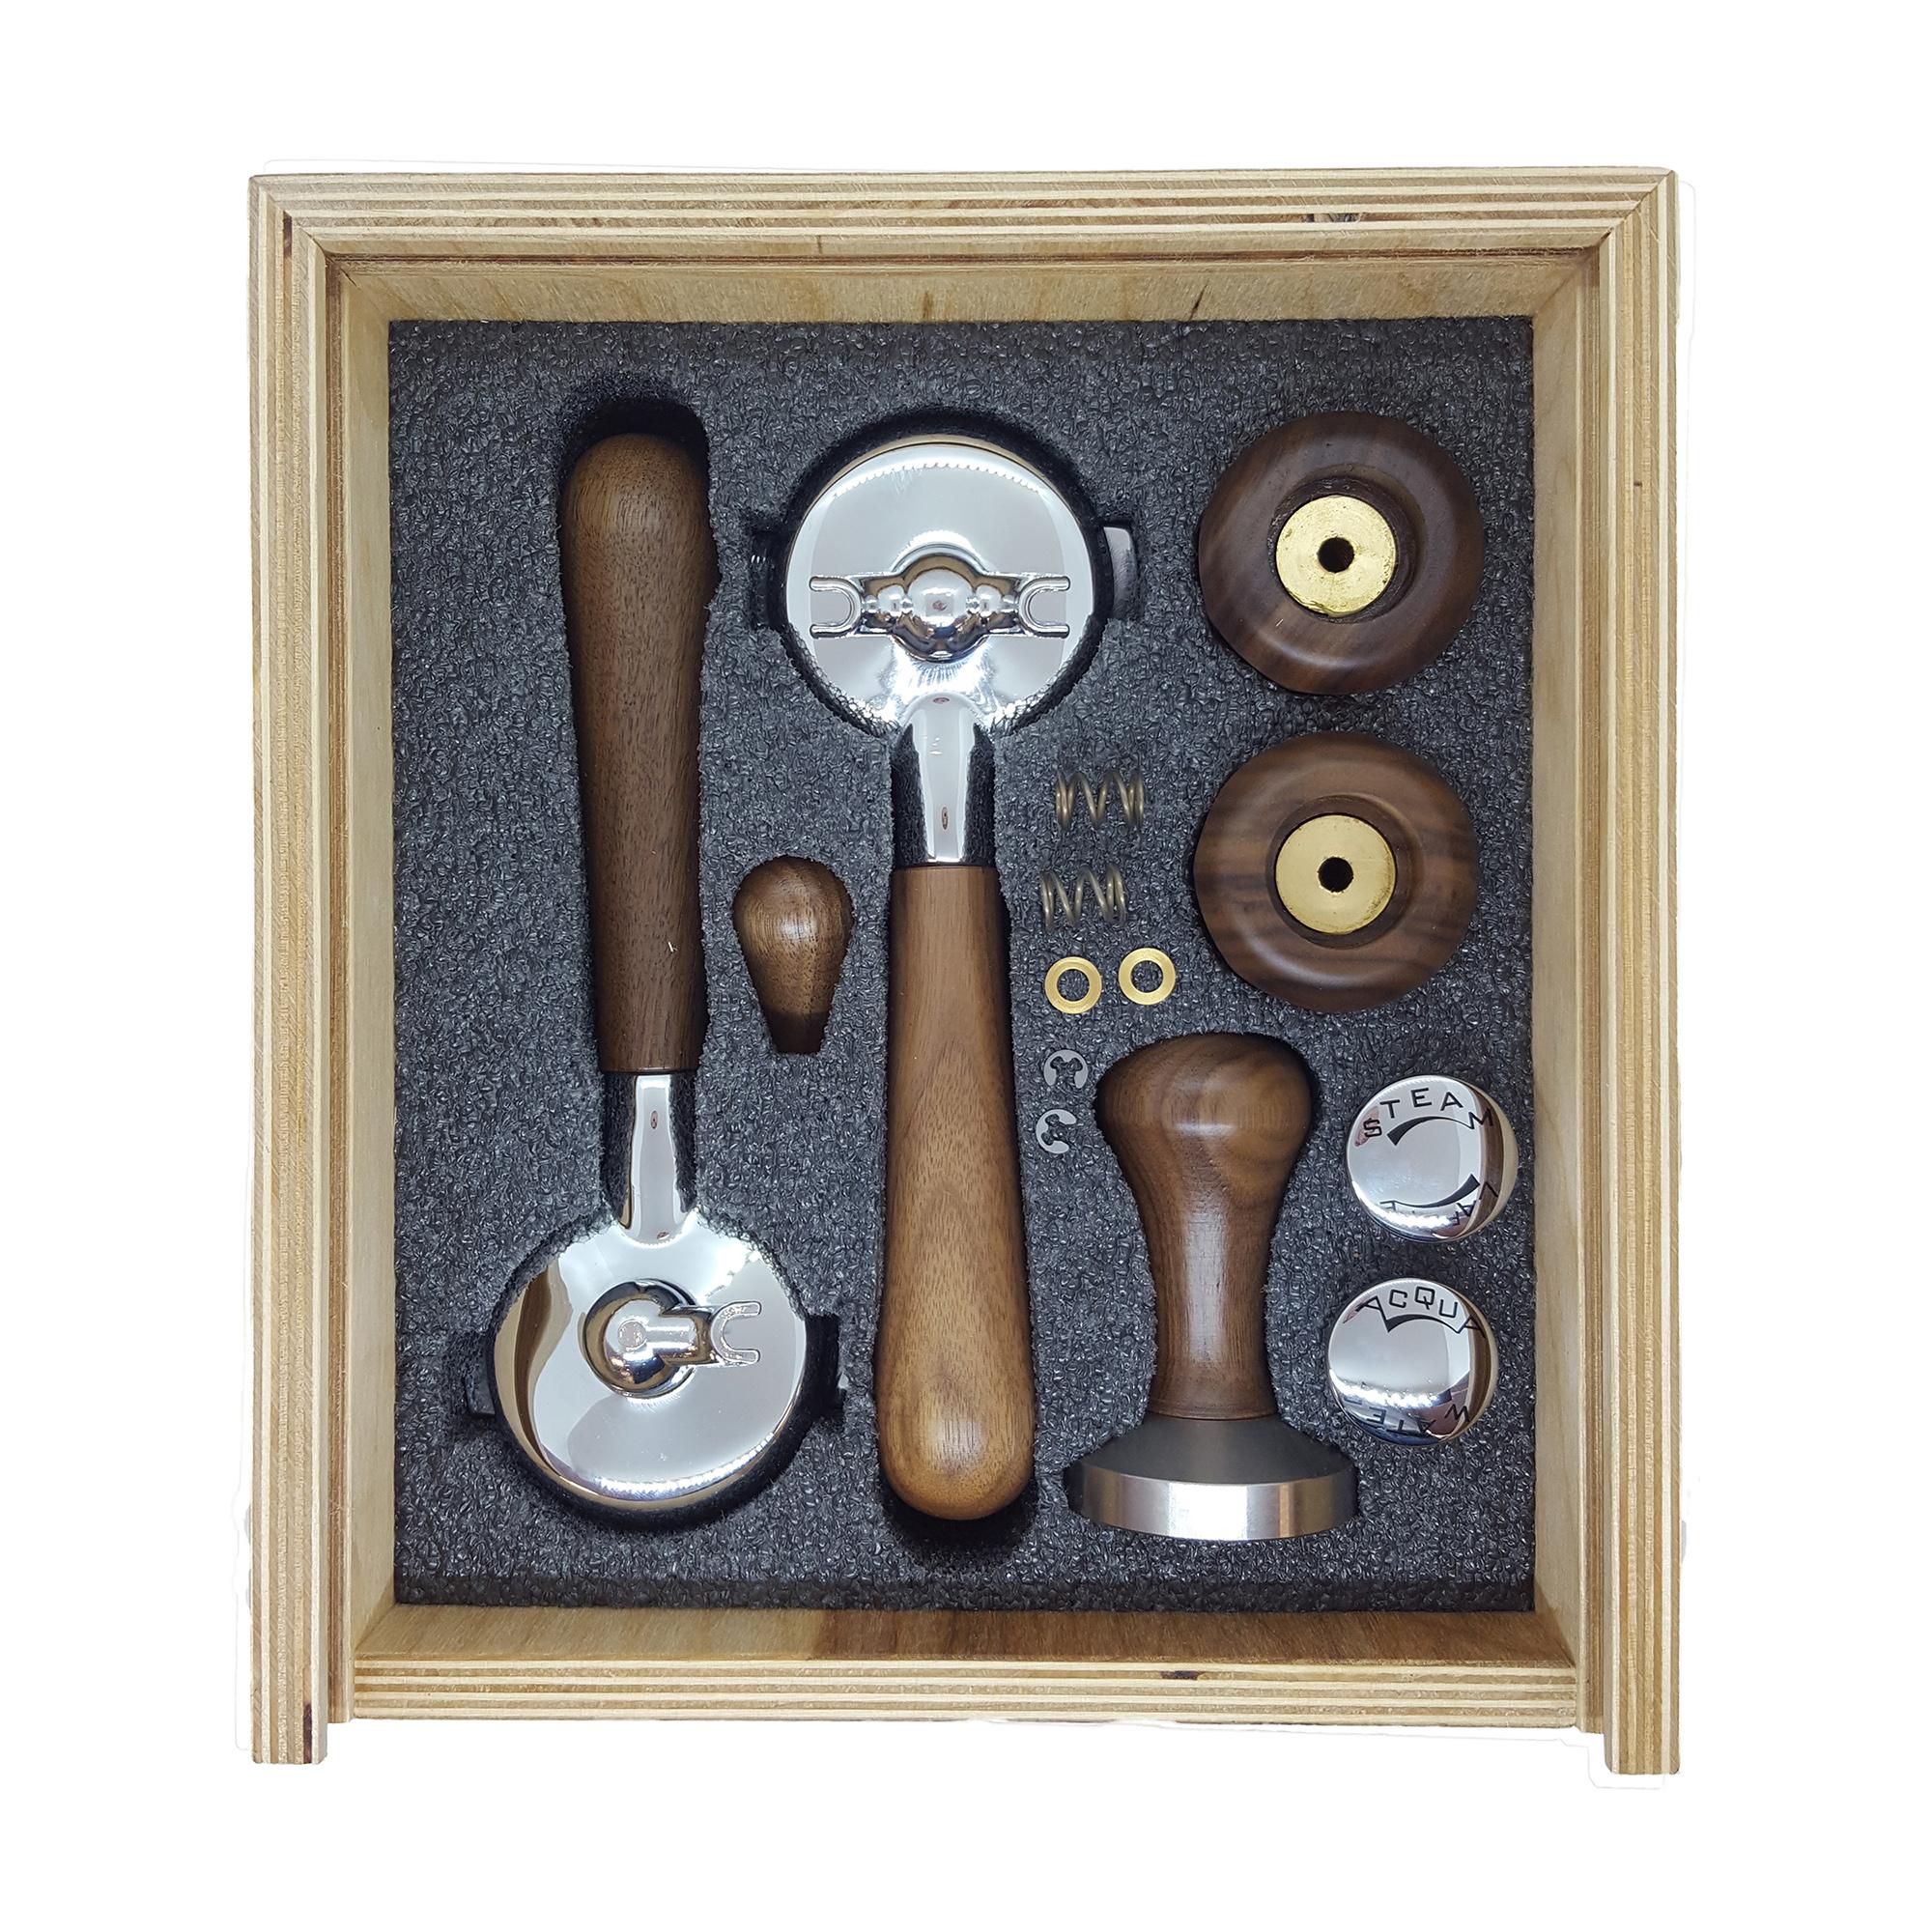 Izzo Knob and Portafilter Accessory Set - Wood